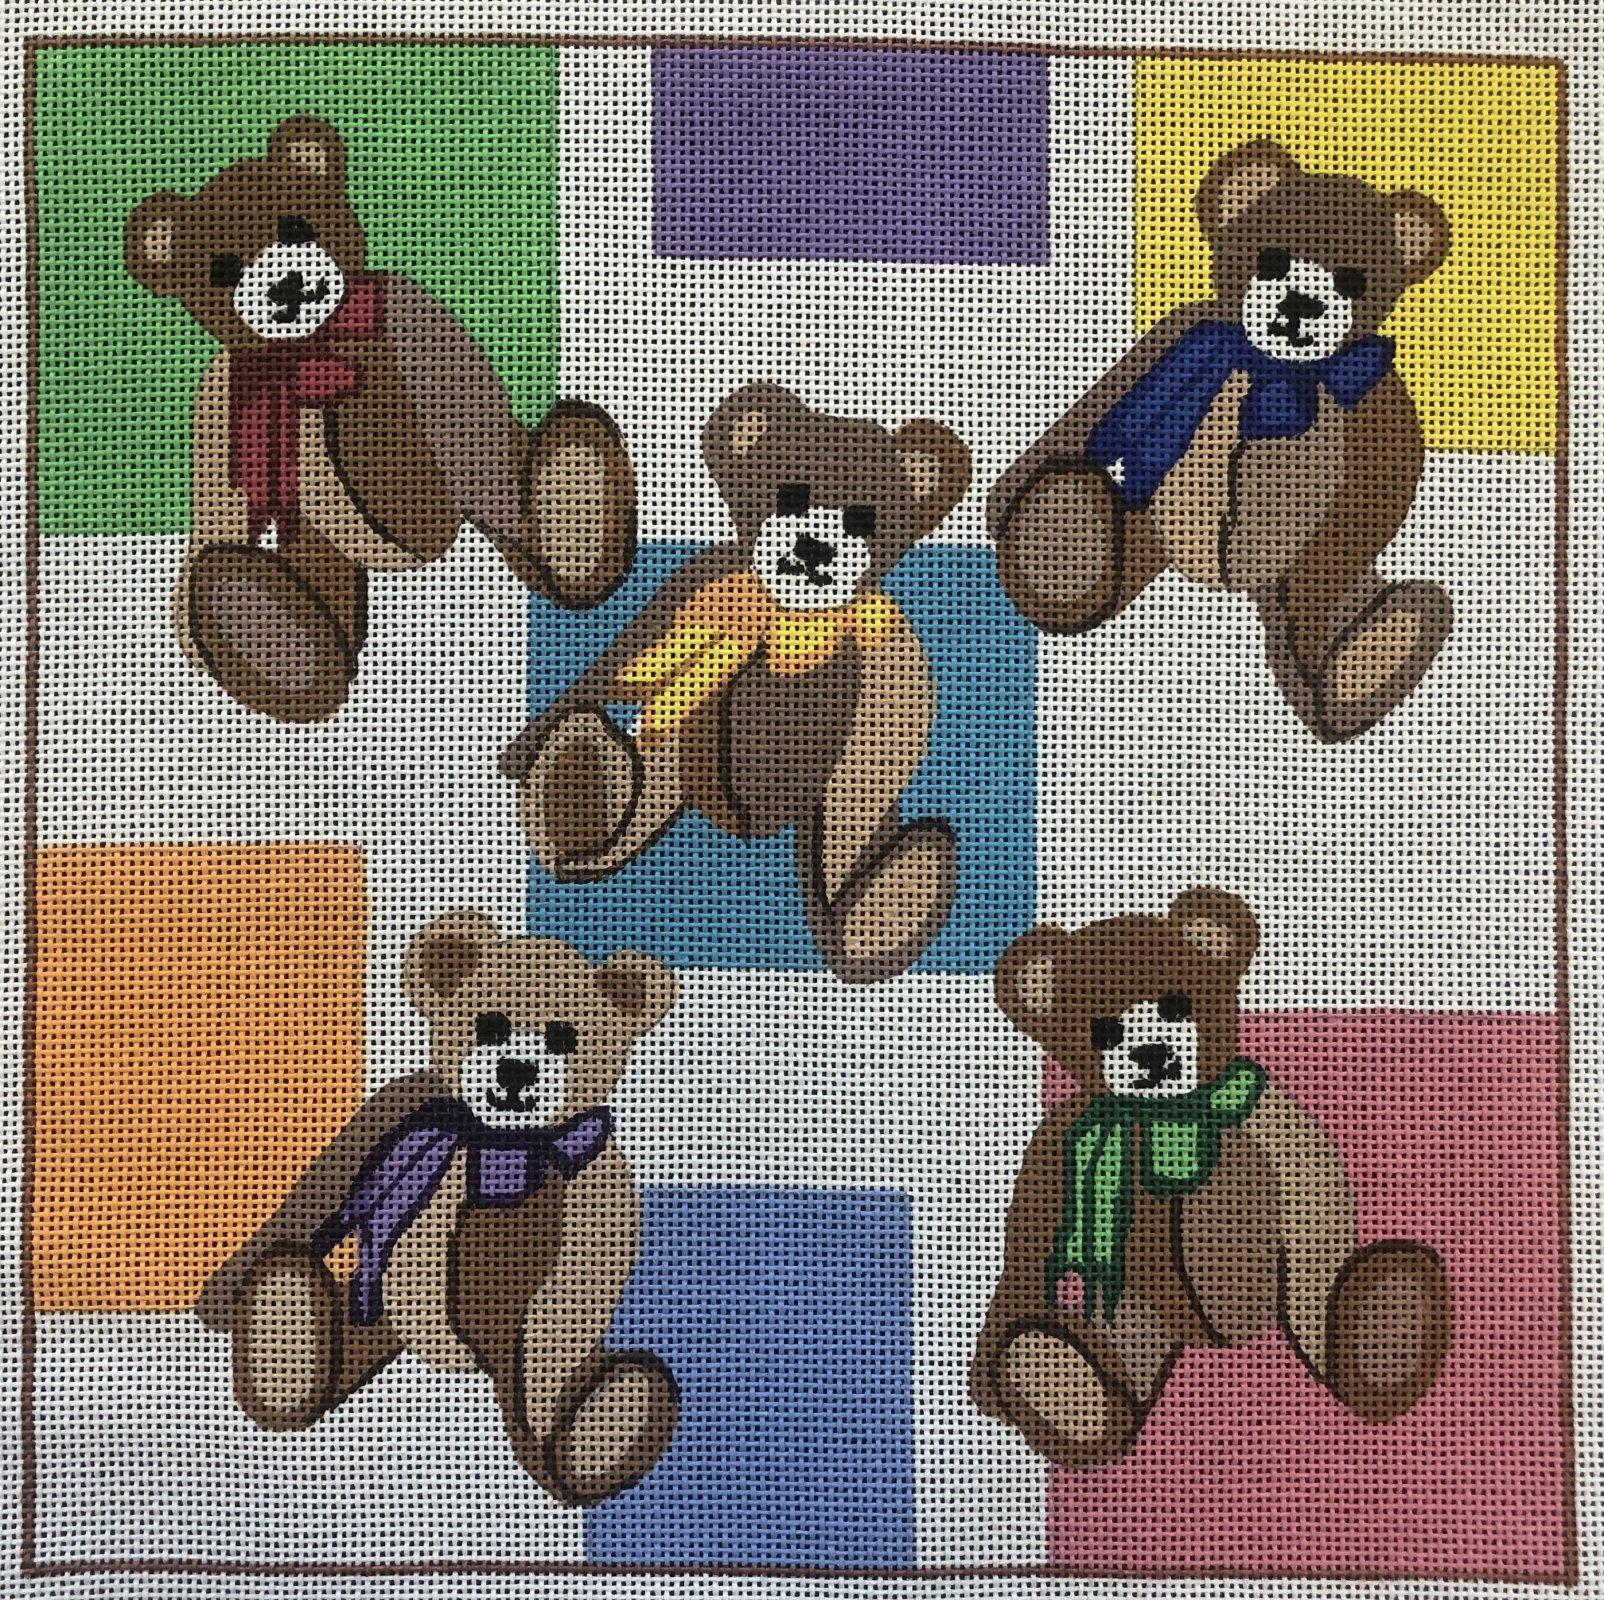 Five Teddy Bears - 13M